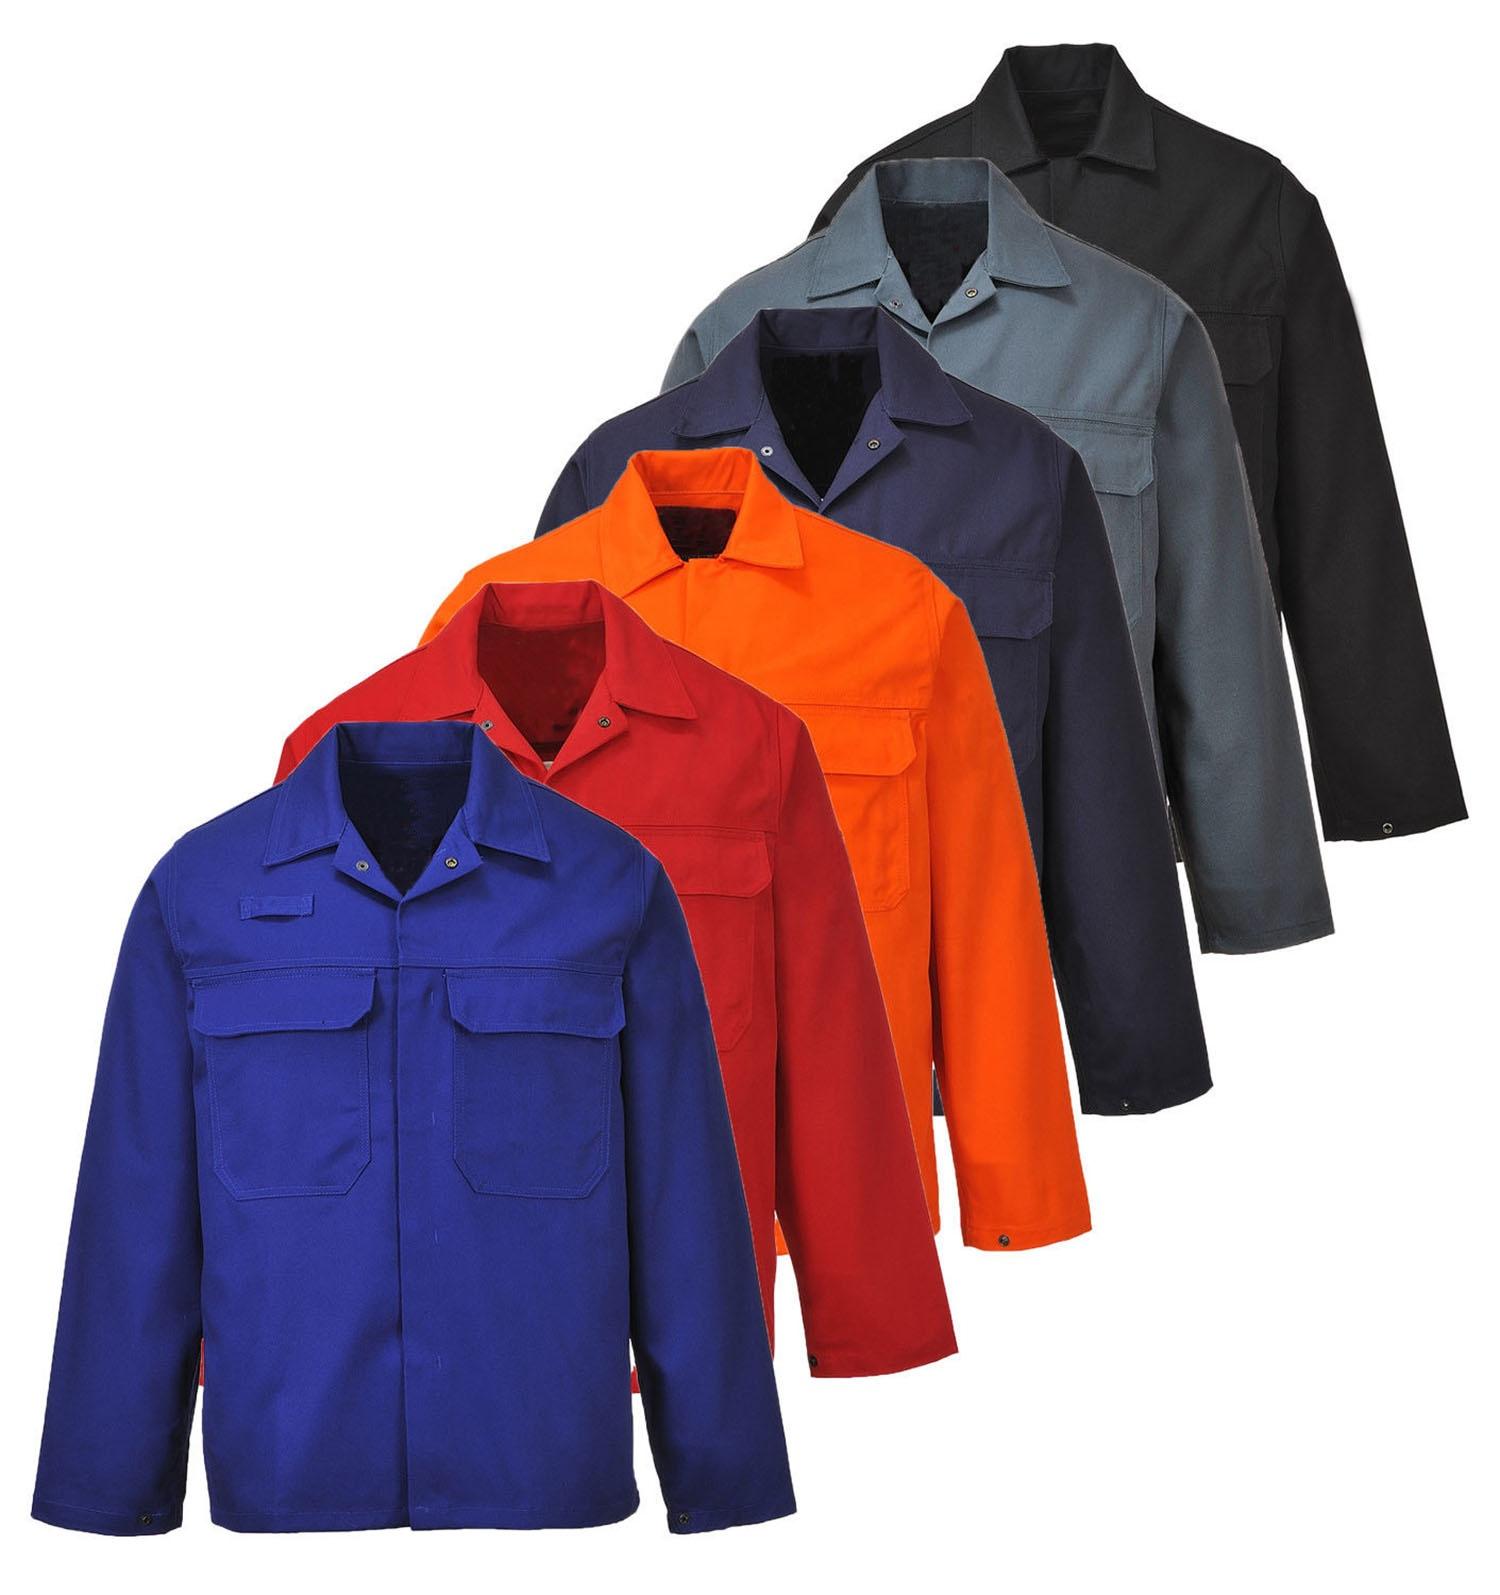 Work Jacket Professional Men's Jackets Coats Engineering Uniform Workwear -  Buy Workwear Uniforms Industrial Uniform,Mens Winter Workwear Set,American  Workwear Product on Alibaba.com